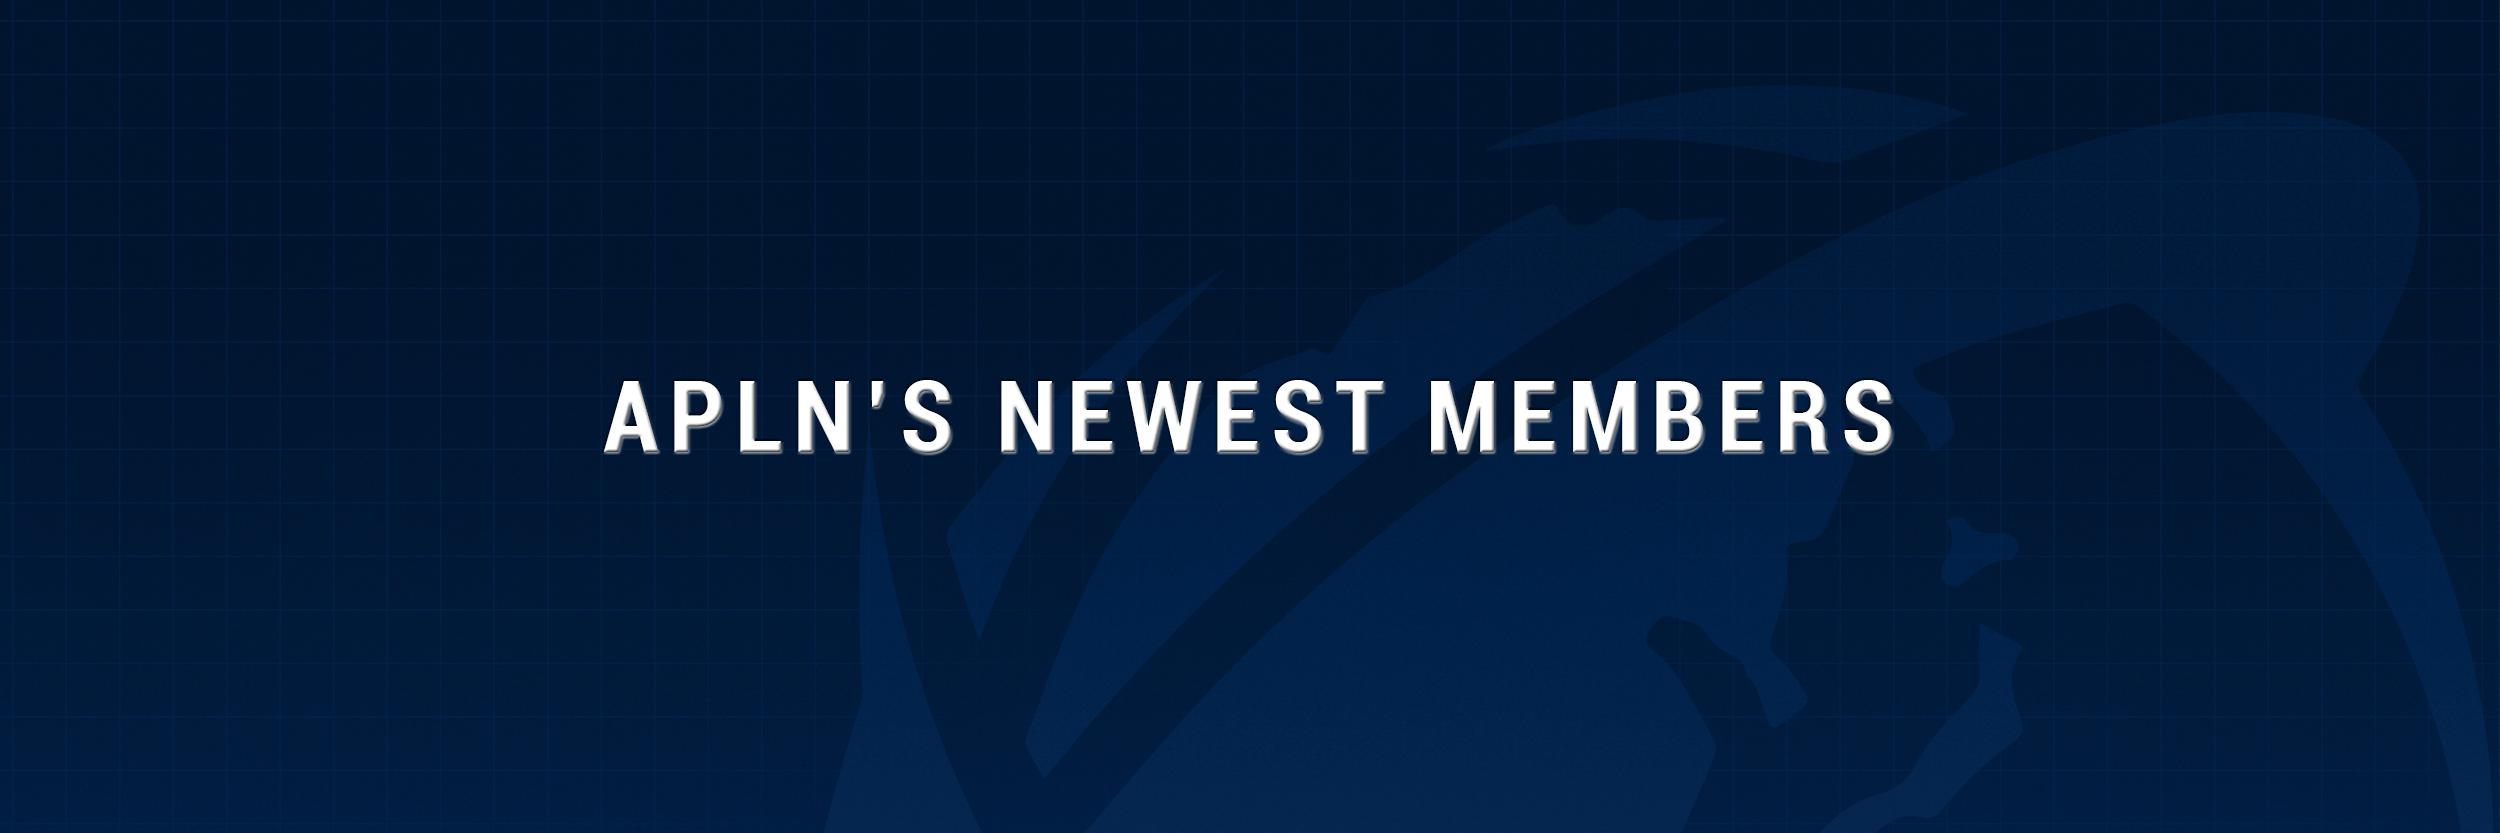 APLN Welcomes New Network Members